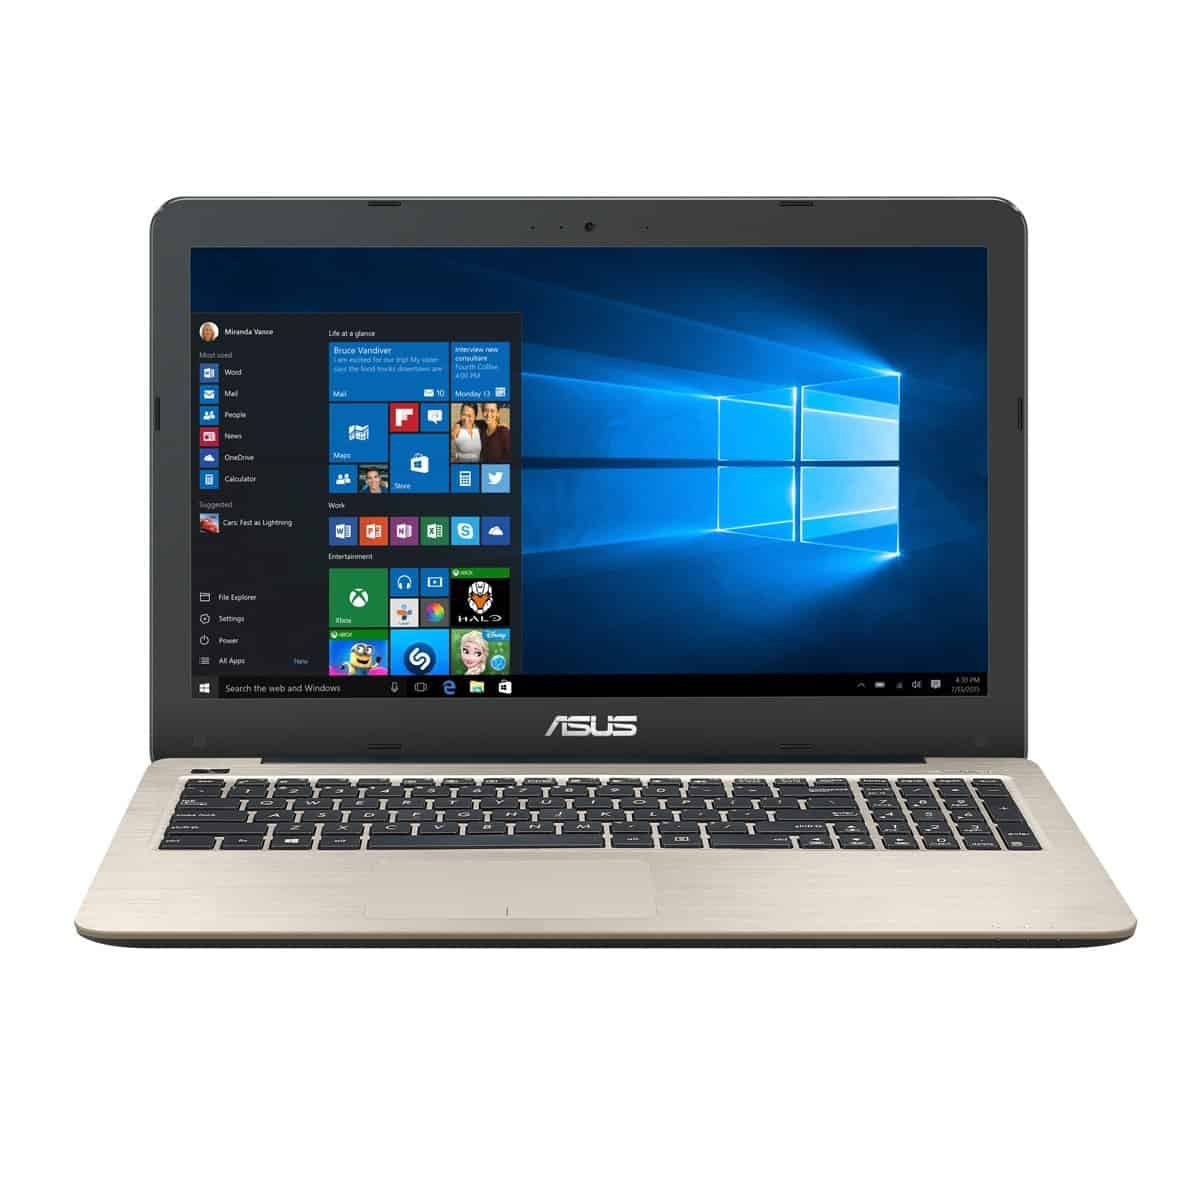 5 Best Laptops with DVD Drive - 2018 - Best Laptops World